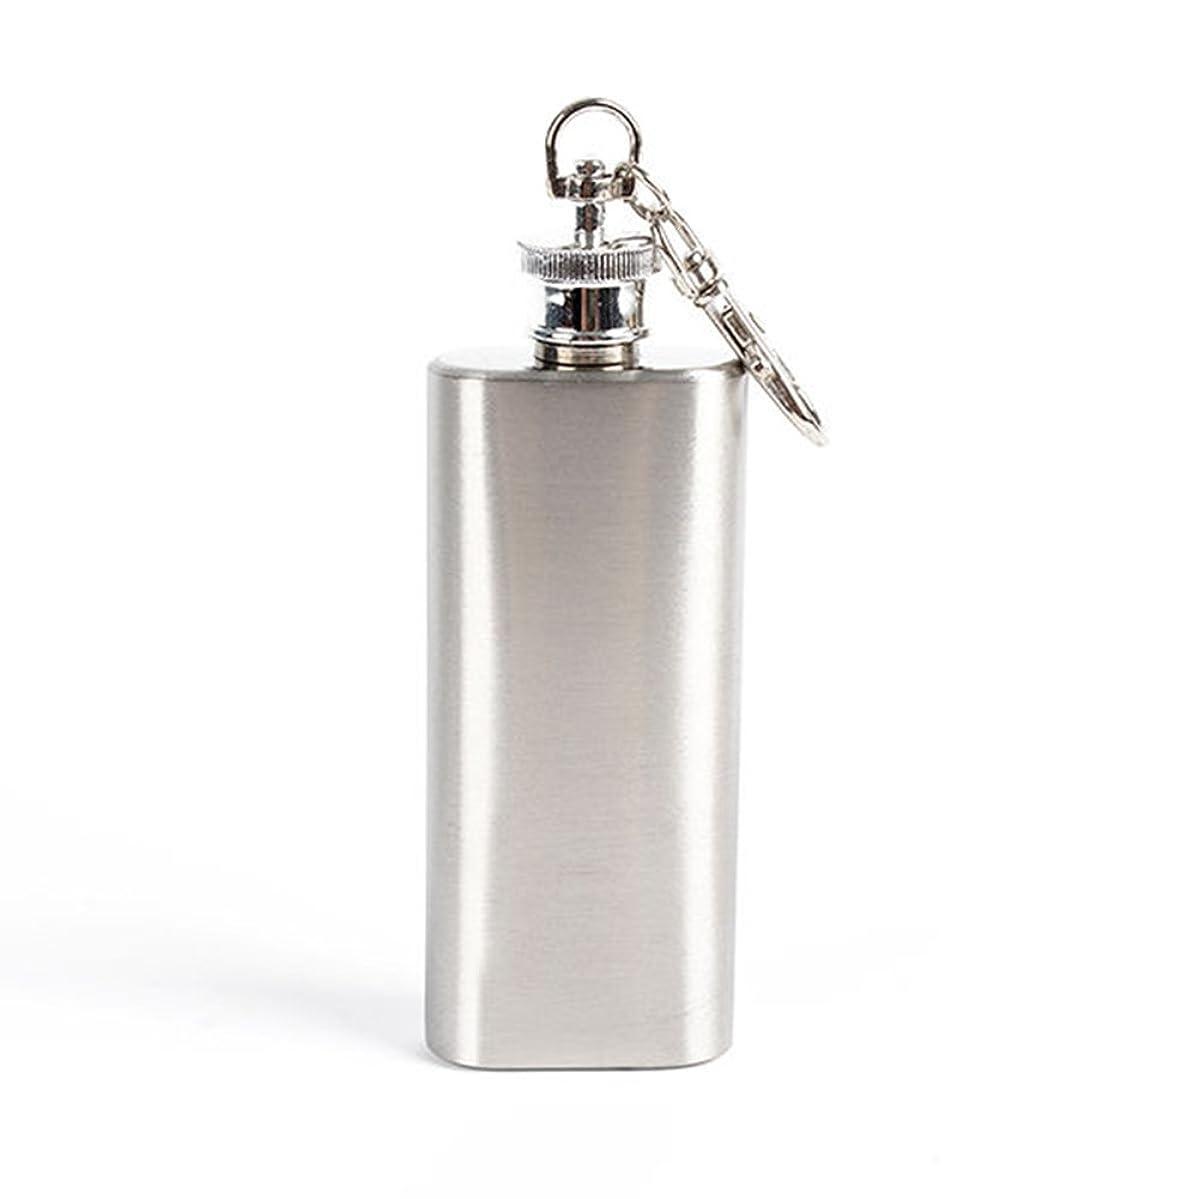 bjduck99 2oz Mini Wine Bottle Stainless Steel Liquor Hip Flask with Screw Cap Portable